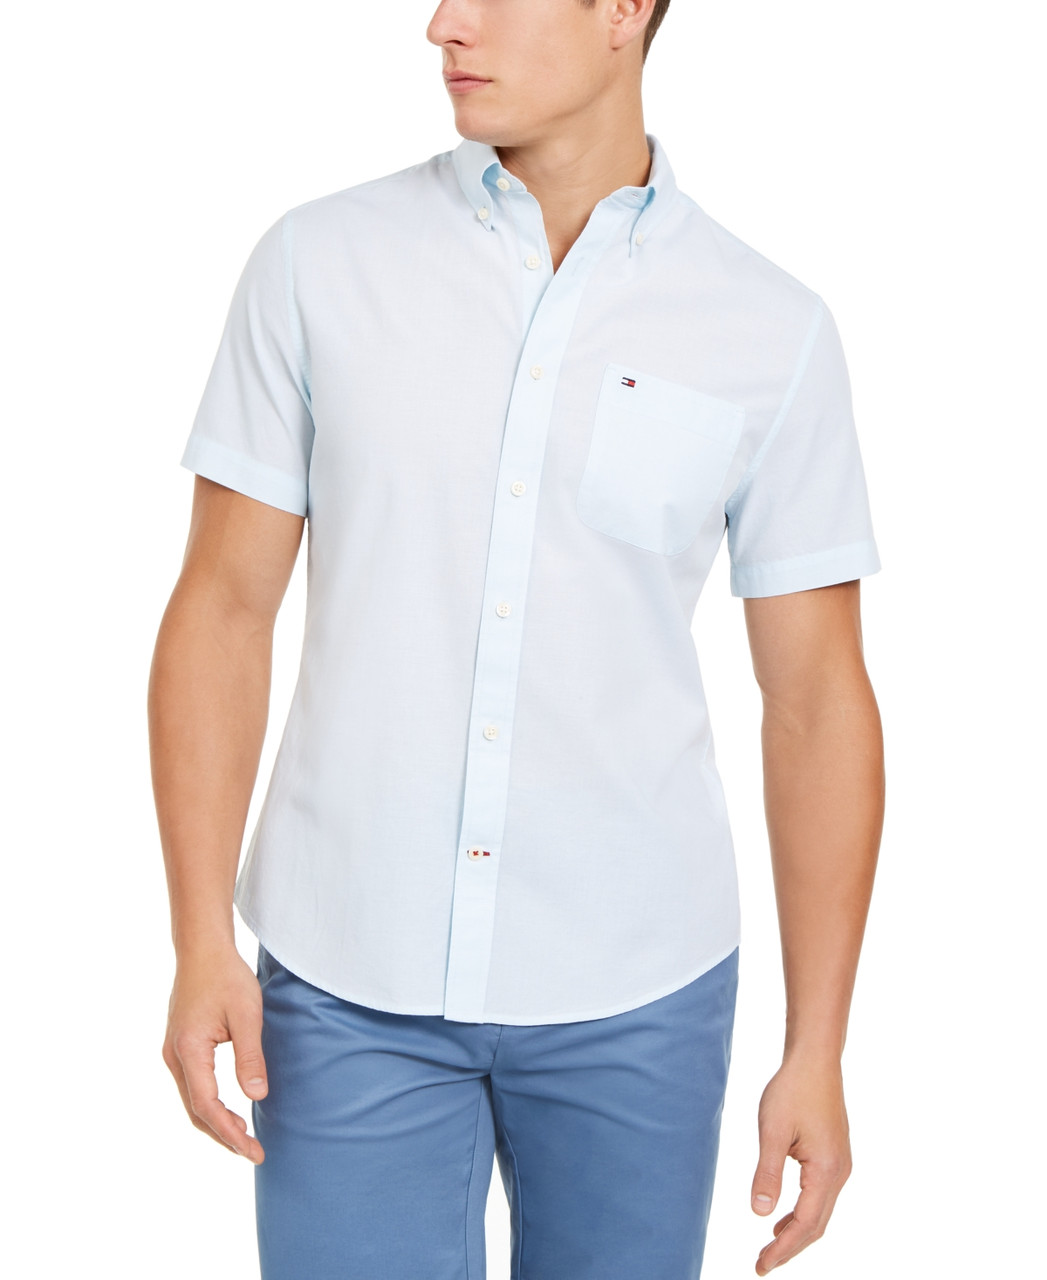 Tommy Hilfiger   Мужская рубашка - А4